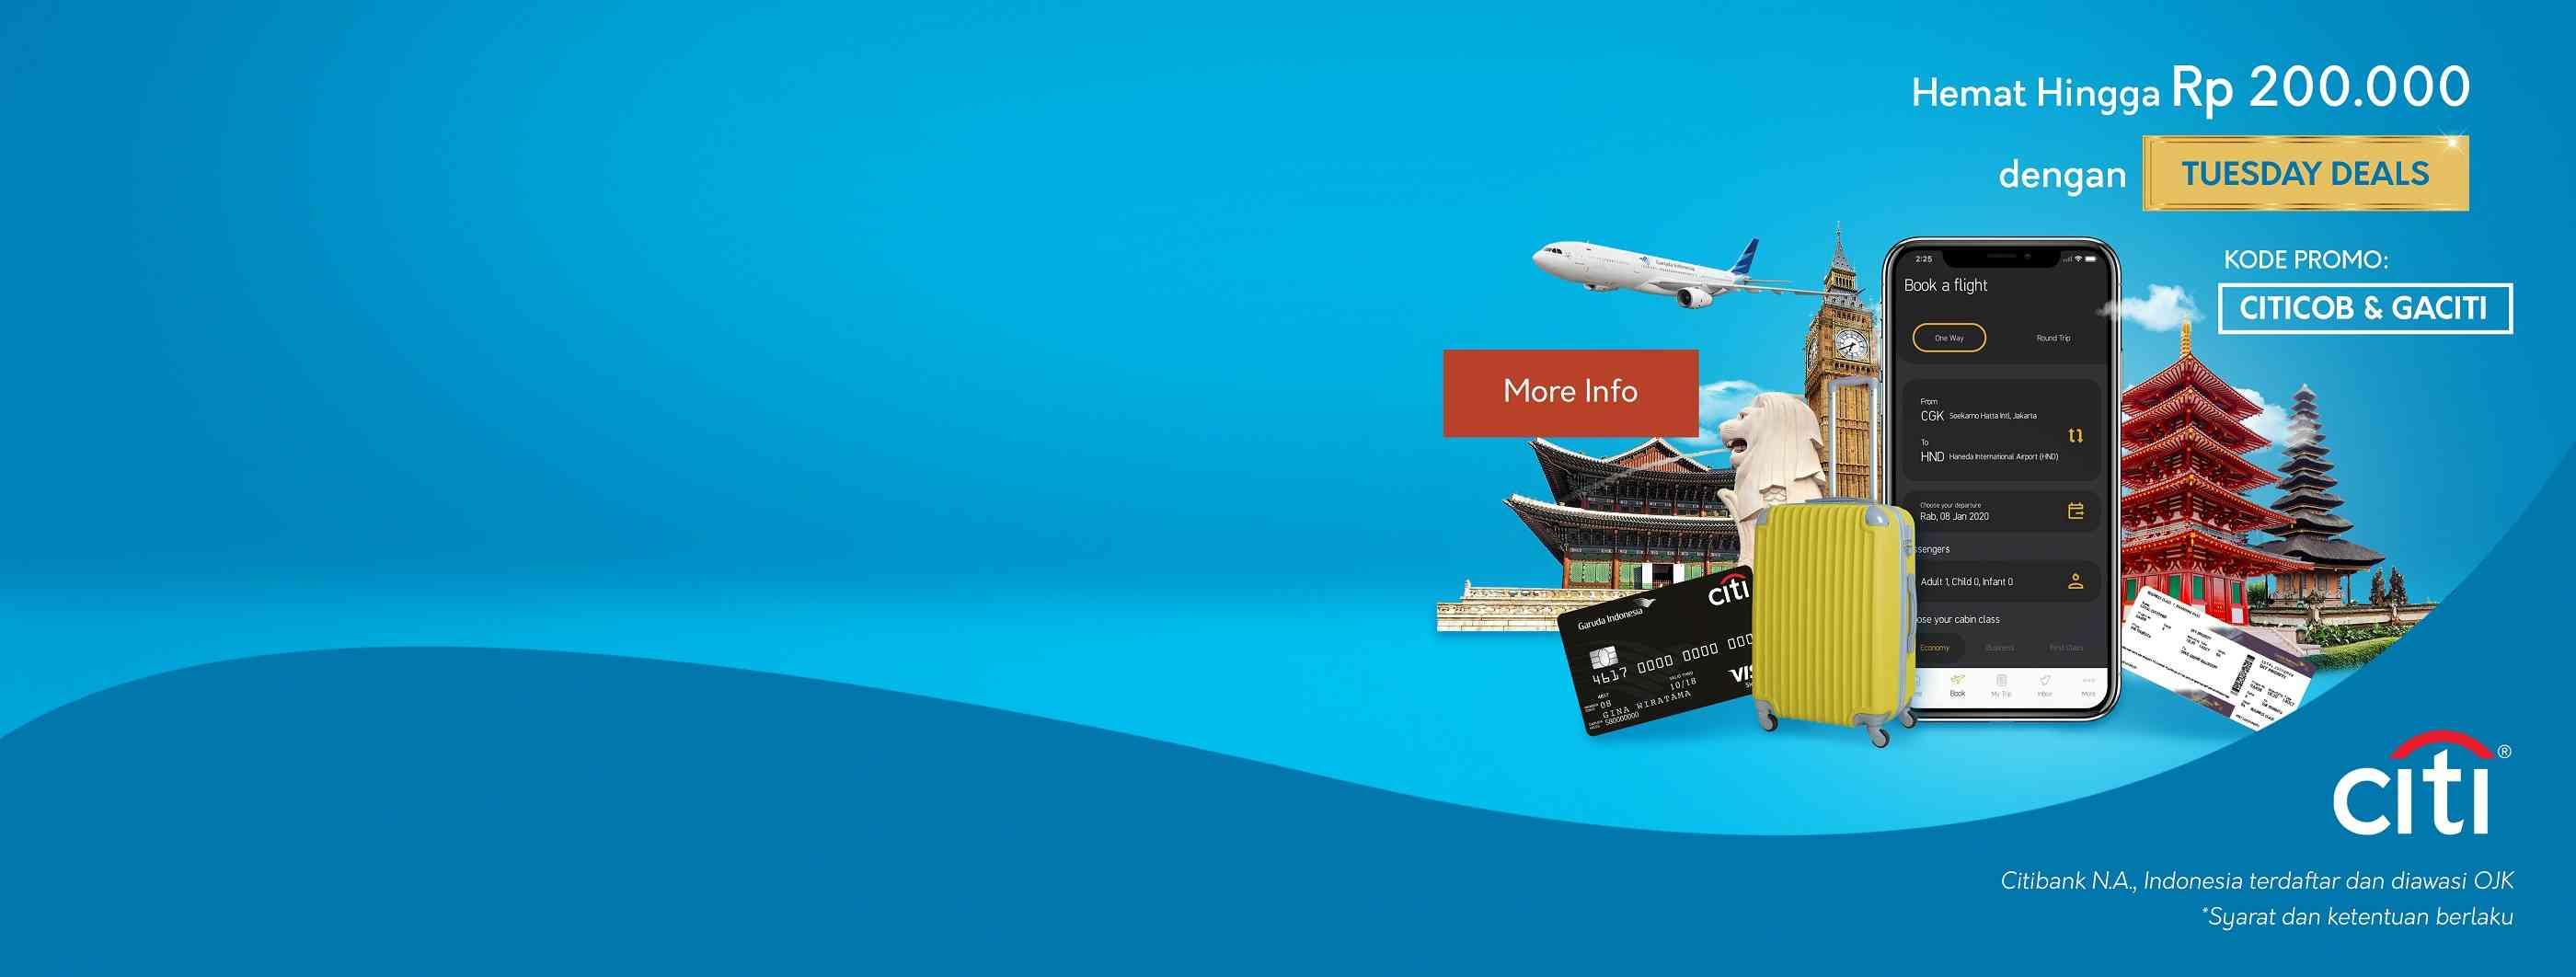 Garuda Indonesia Promo Hemat Hingga Rp. 200.000 Dengan Tuesday Deals Dari Citibank